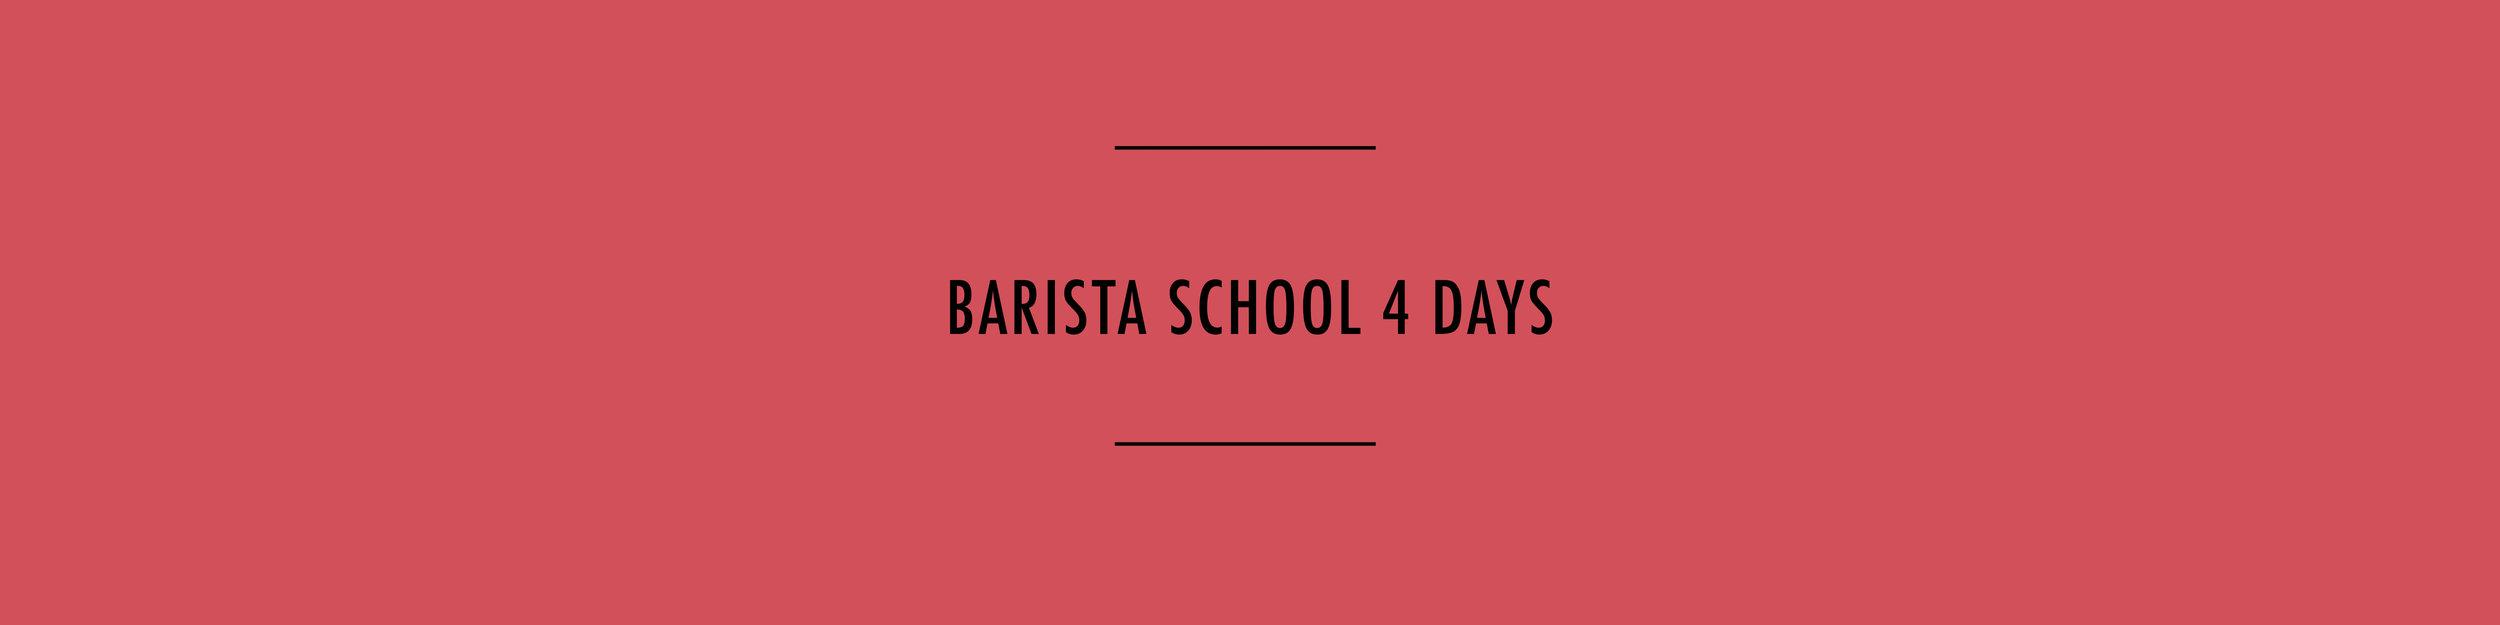 BARISTA SCHOOL.jpg